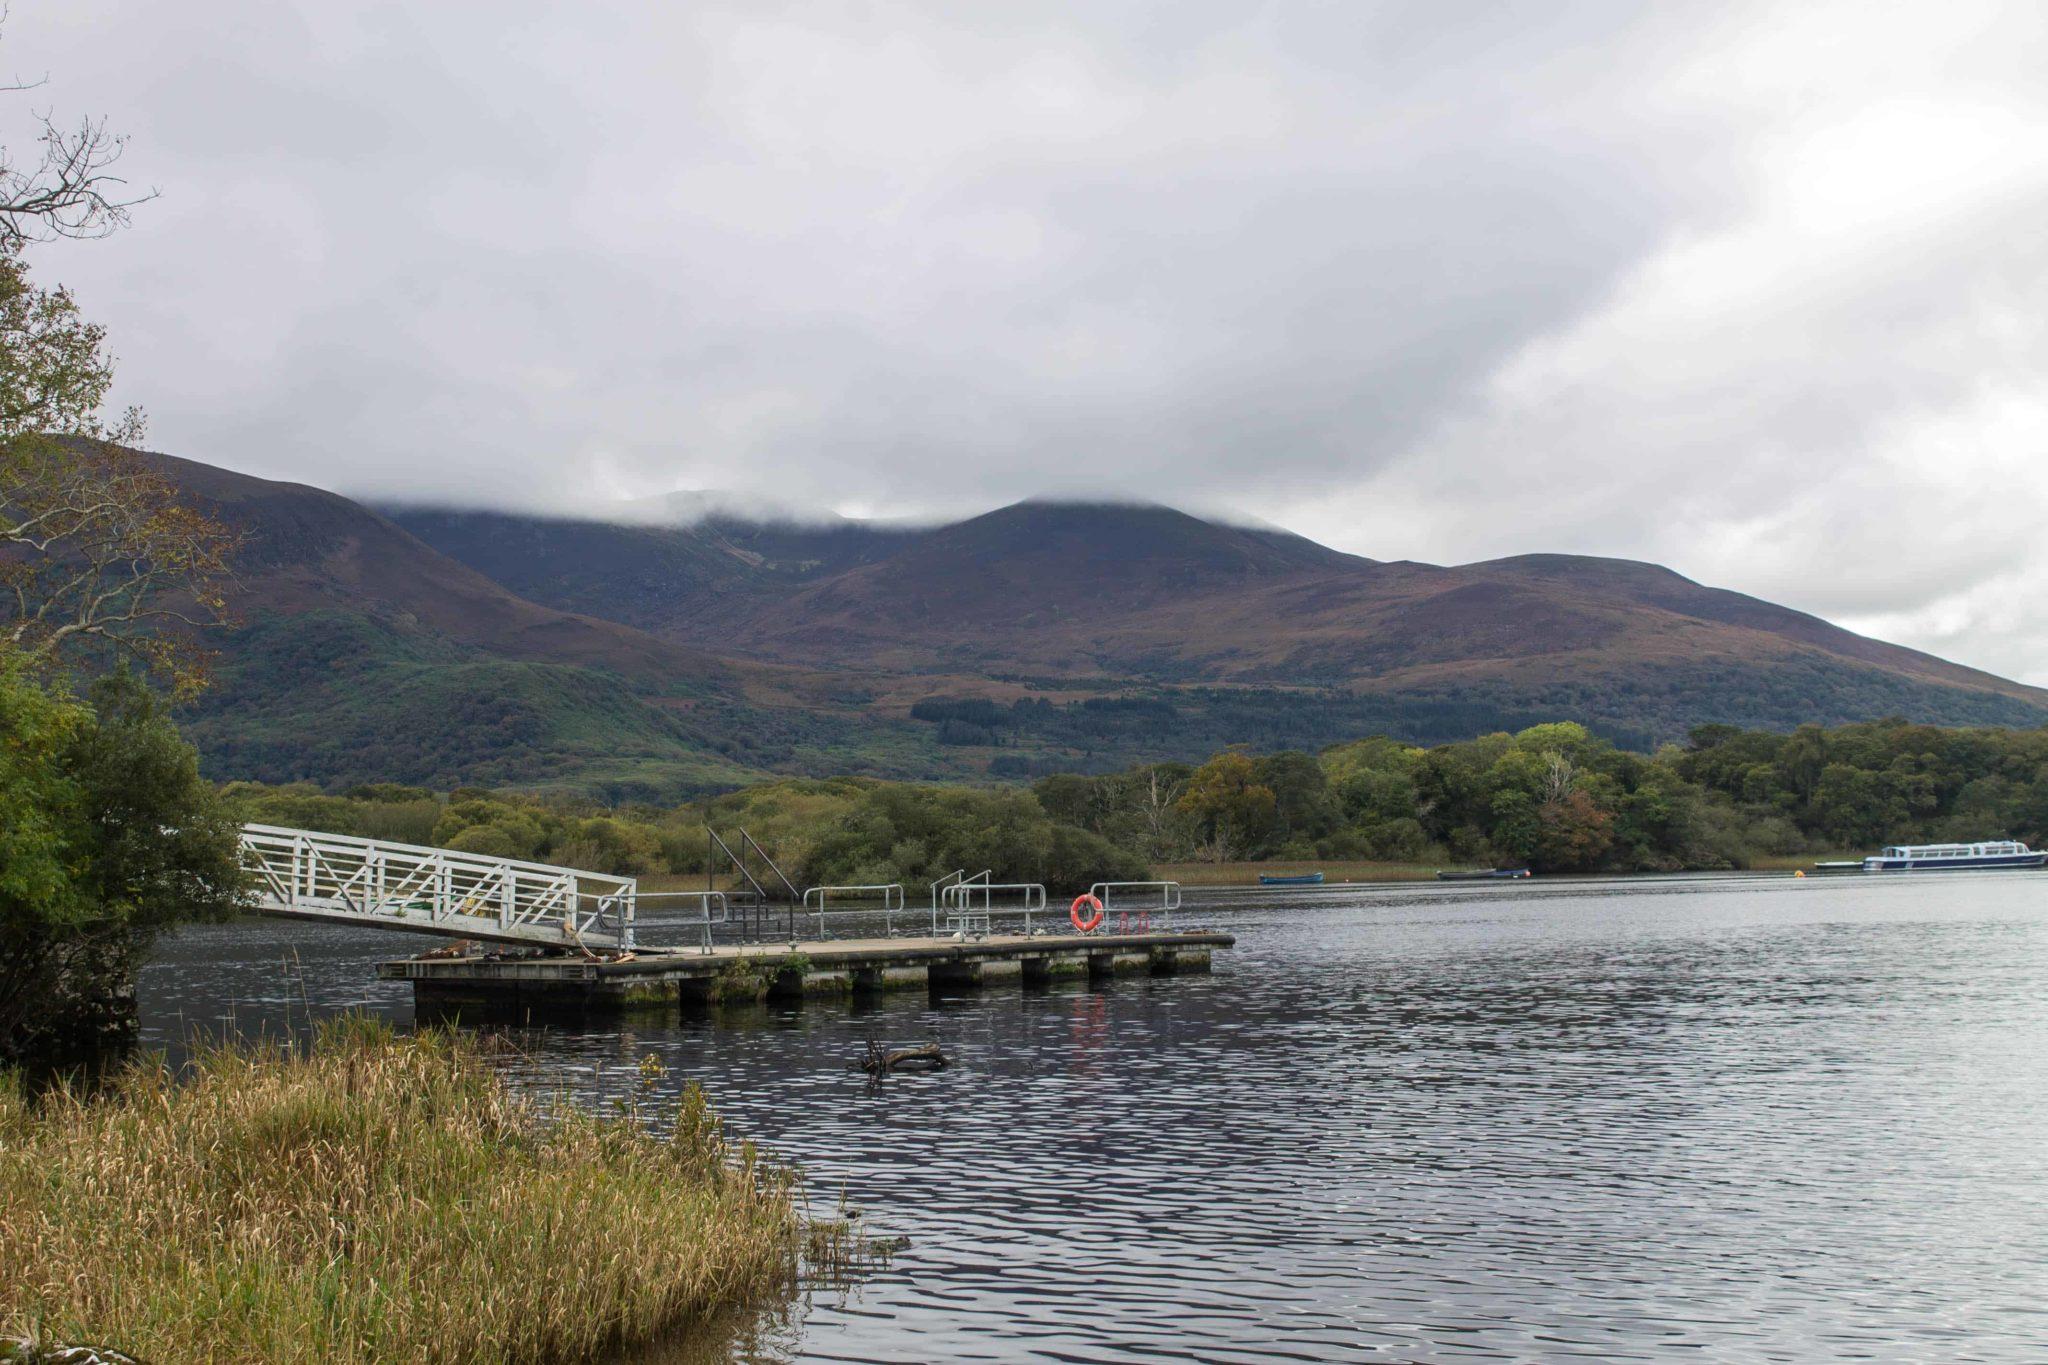 view of the beautiful loch in Killarney Ireland